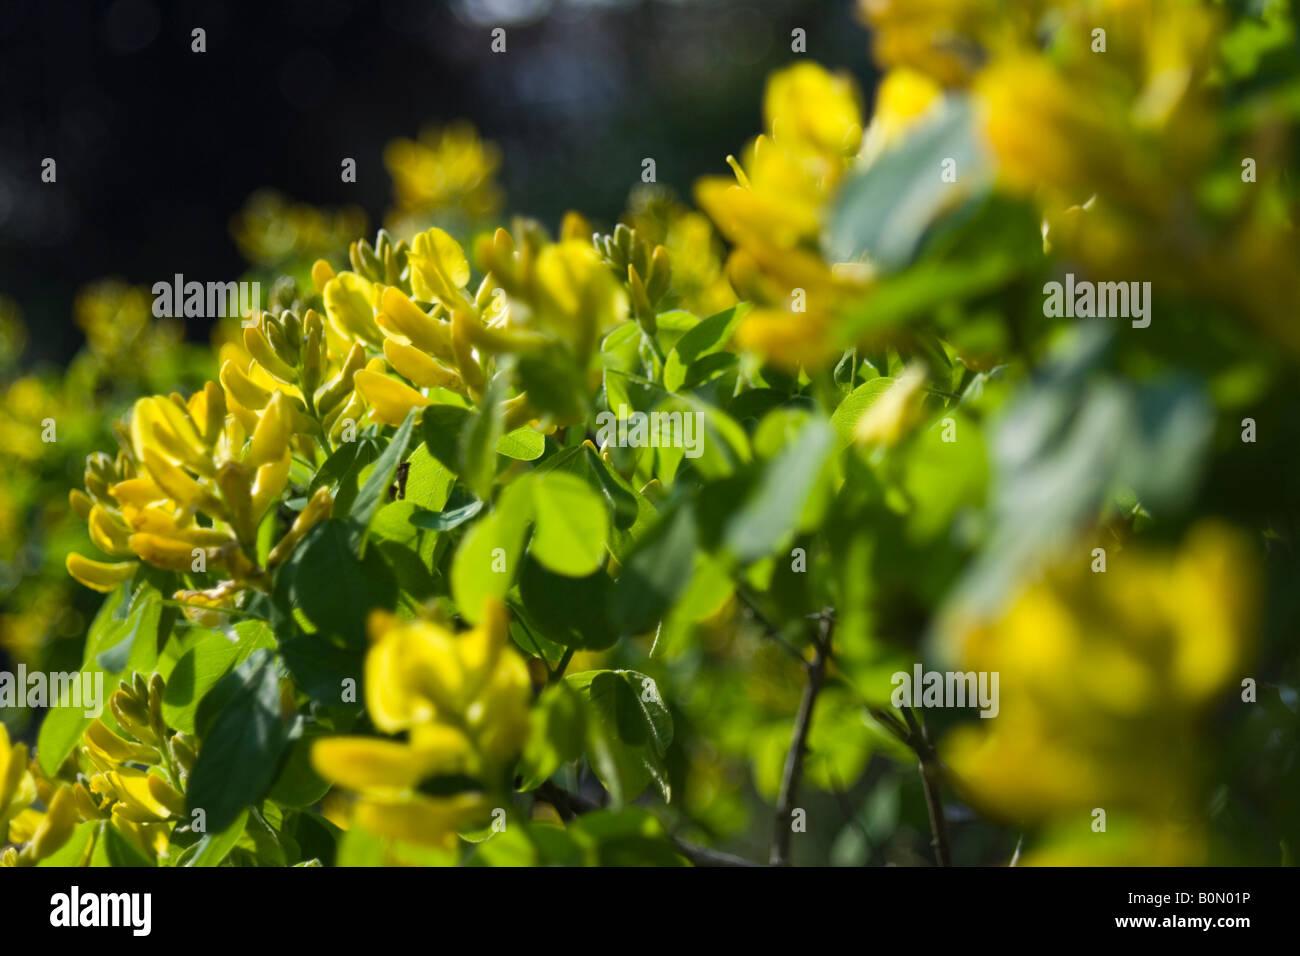 joseph dupouy nature petteria ramentacea cytise Stock Photo